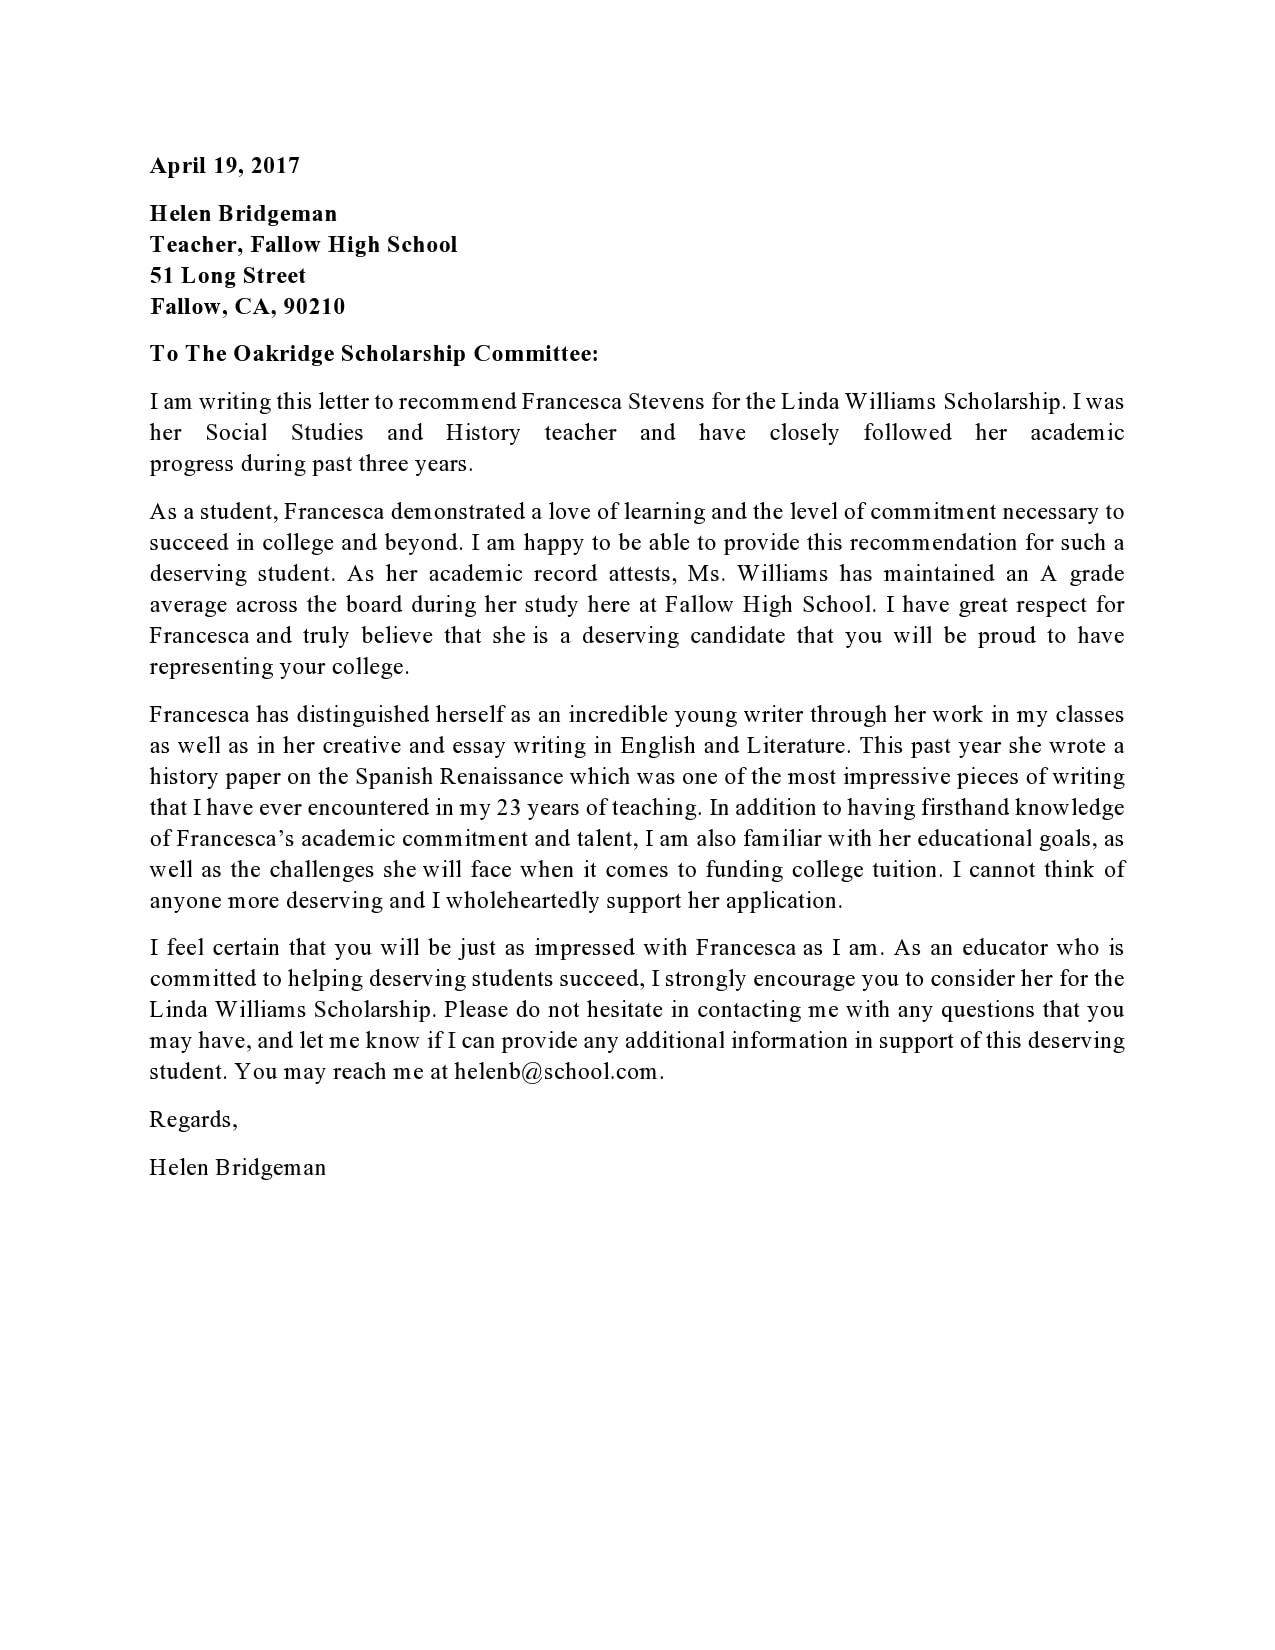 recommendation letter for scholarship 26